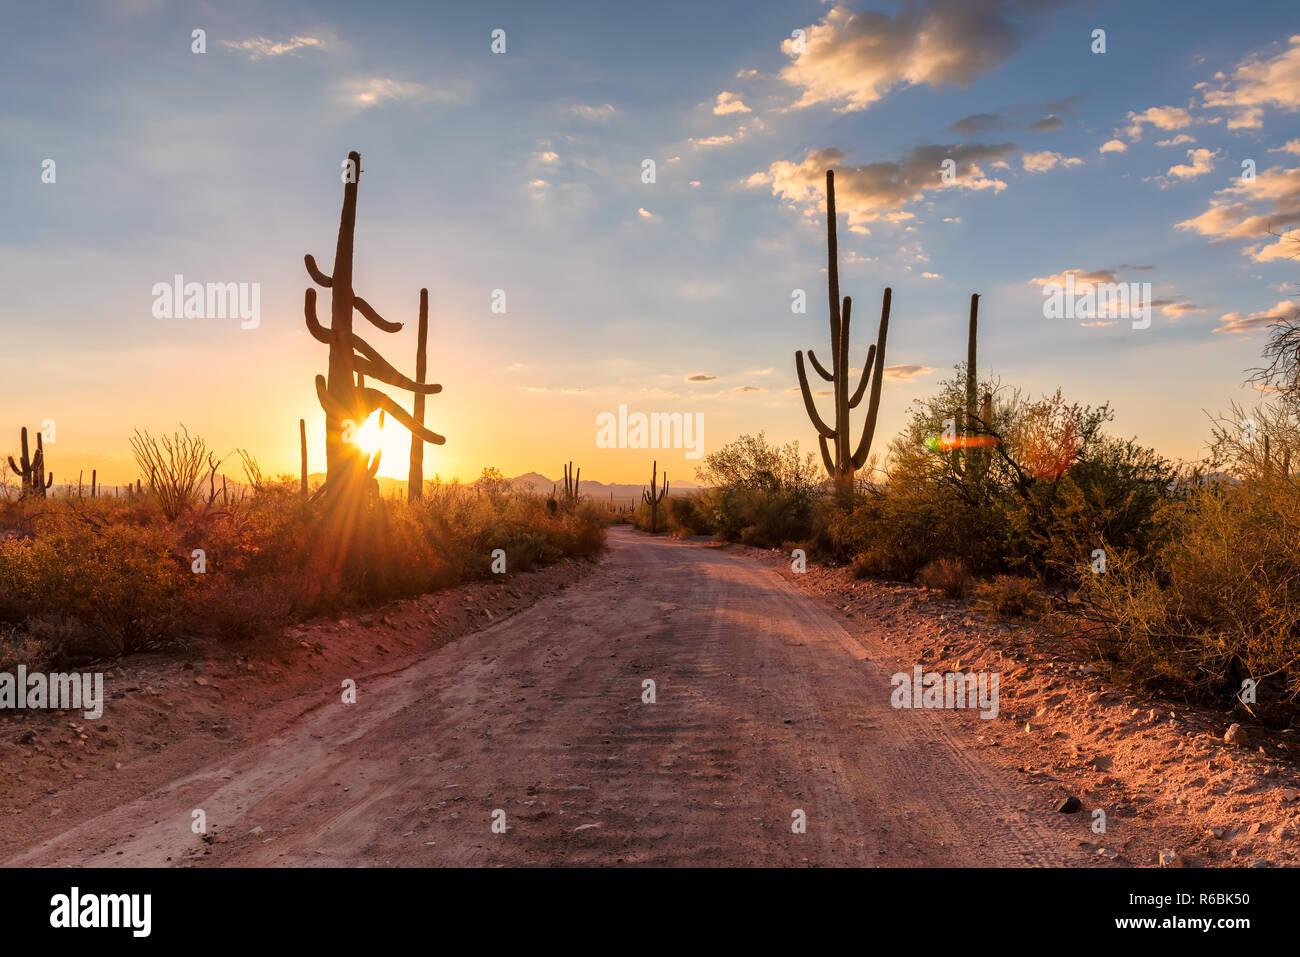 Arizona desert road with Saguaro cacti - Stock Image